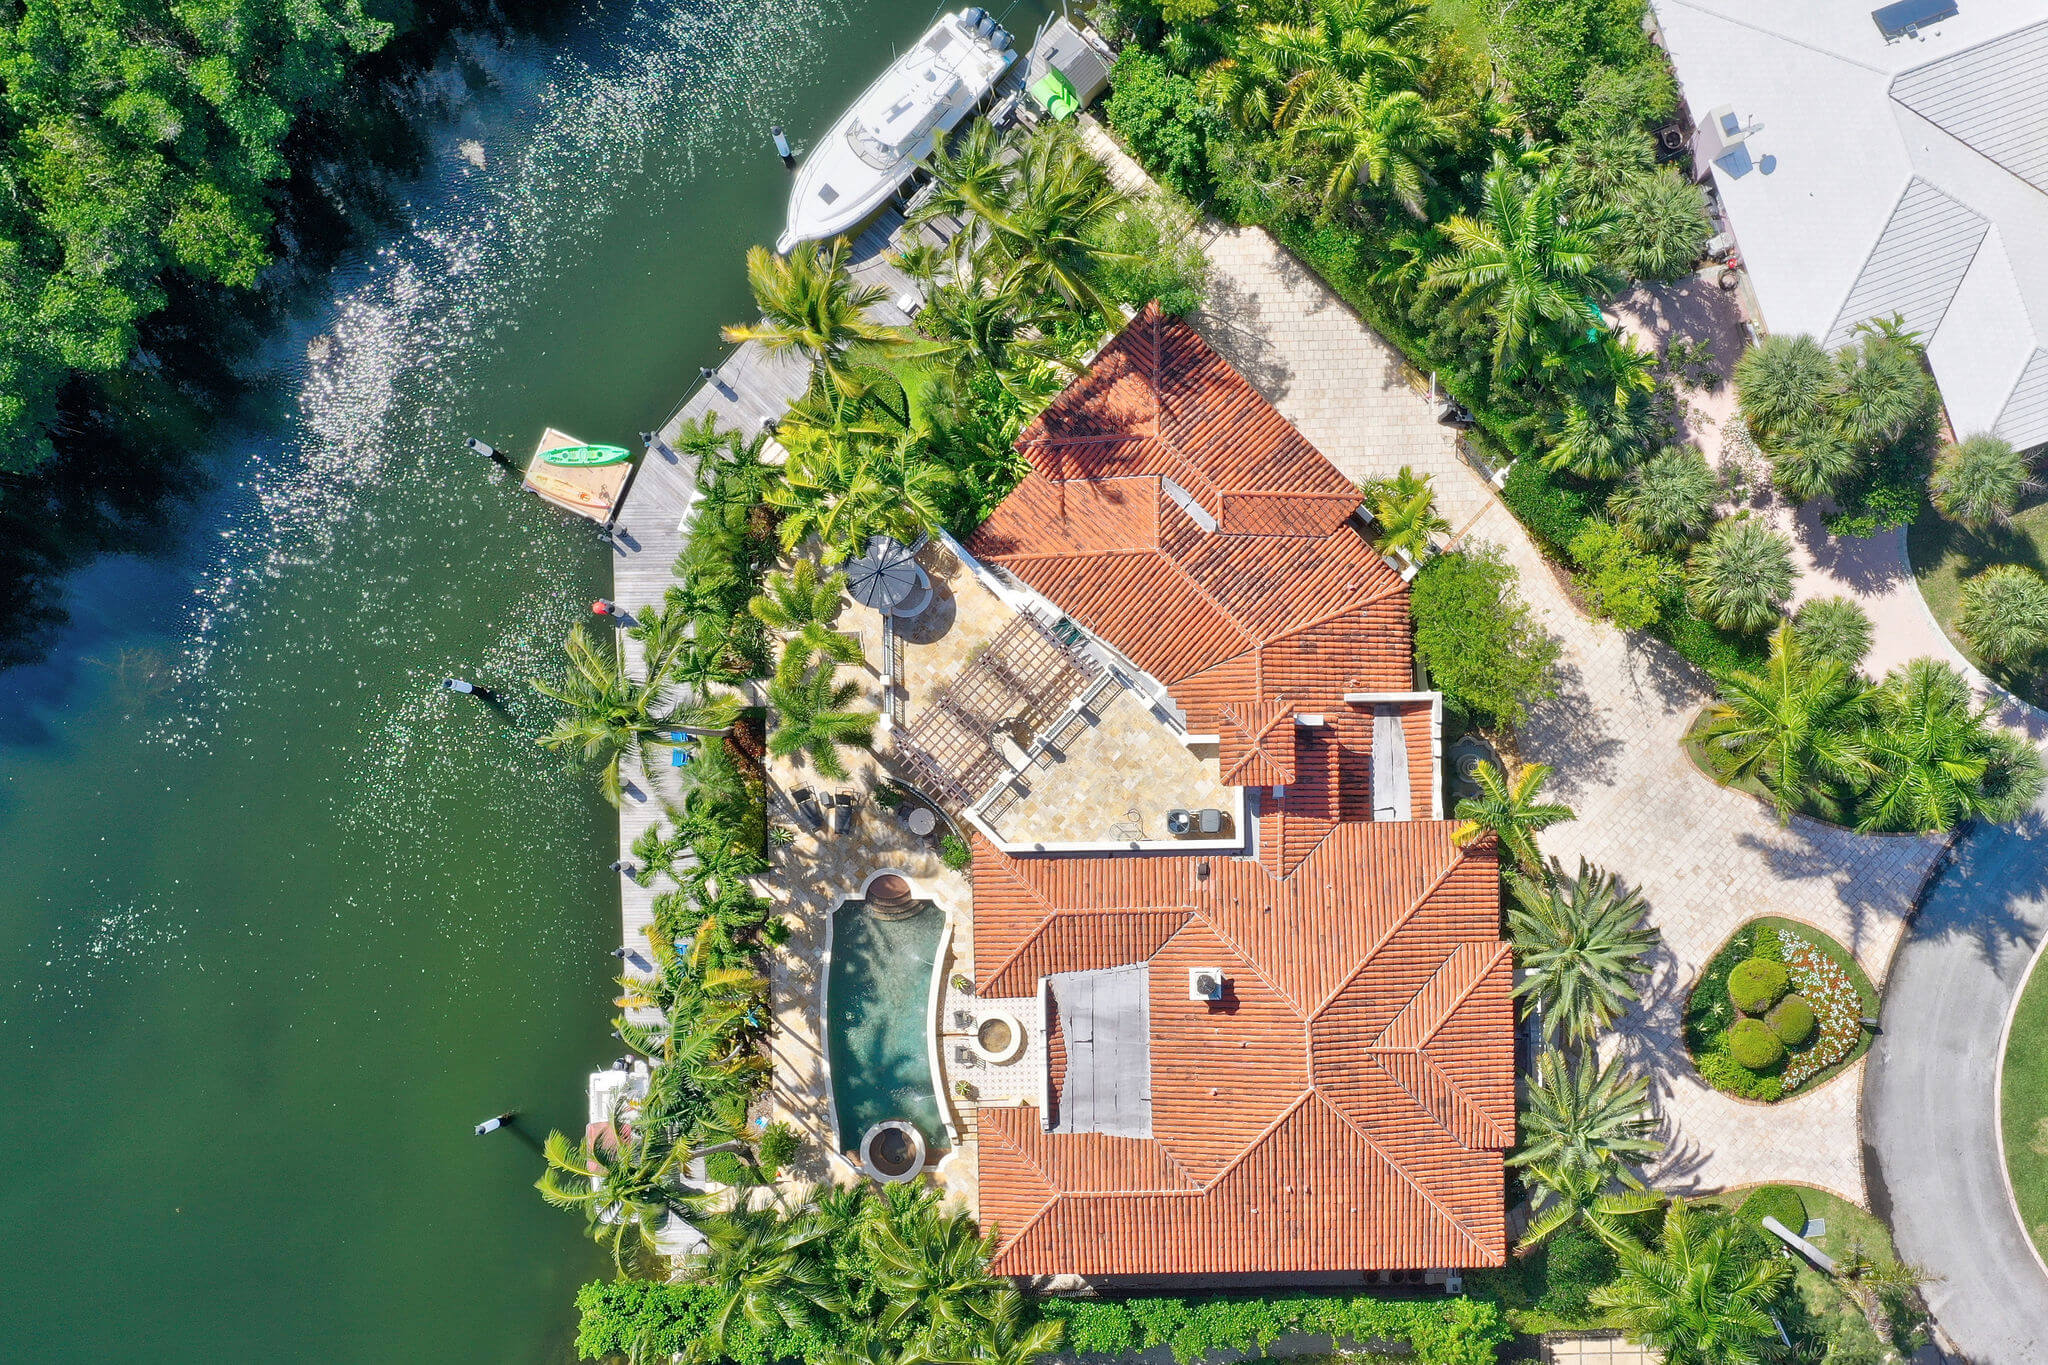 1_photo_by_MiamiRealEstatePhotographers.com.jpg